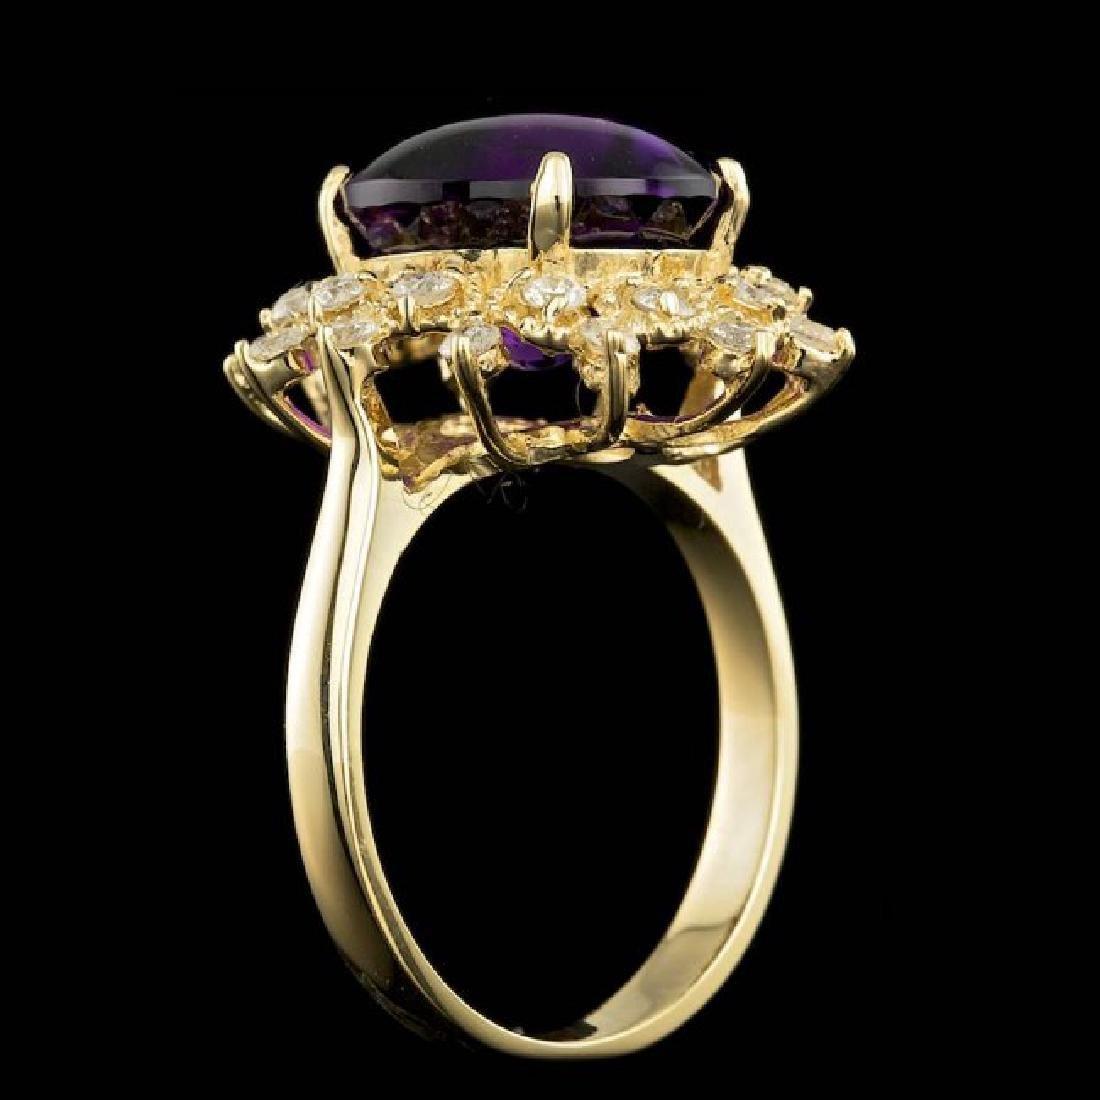 14k Gold 5.00ct Amethyst 0.70ct Diamond Ring - 5